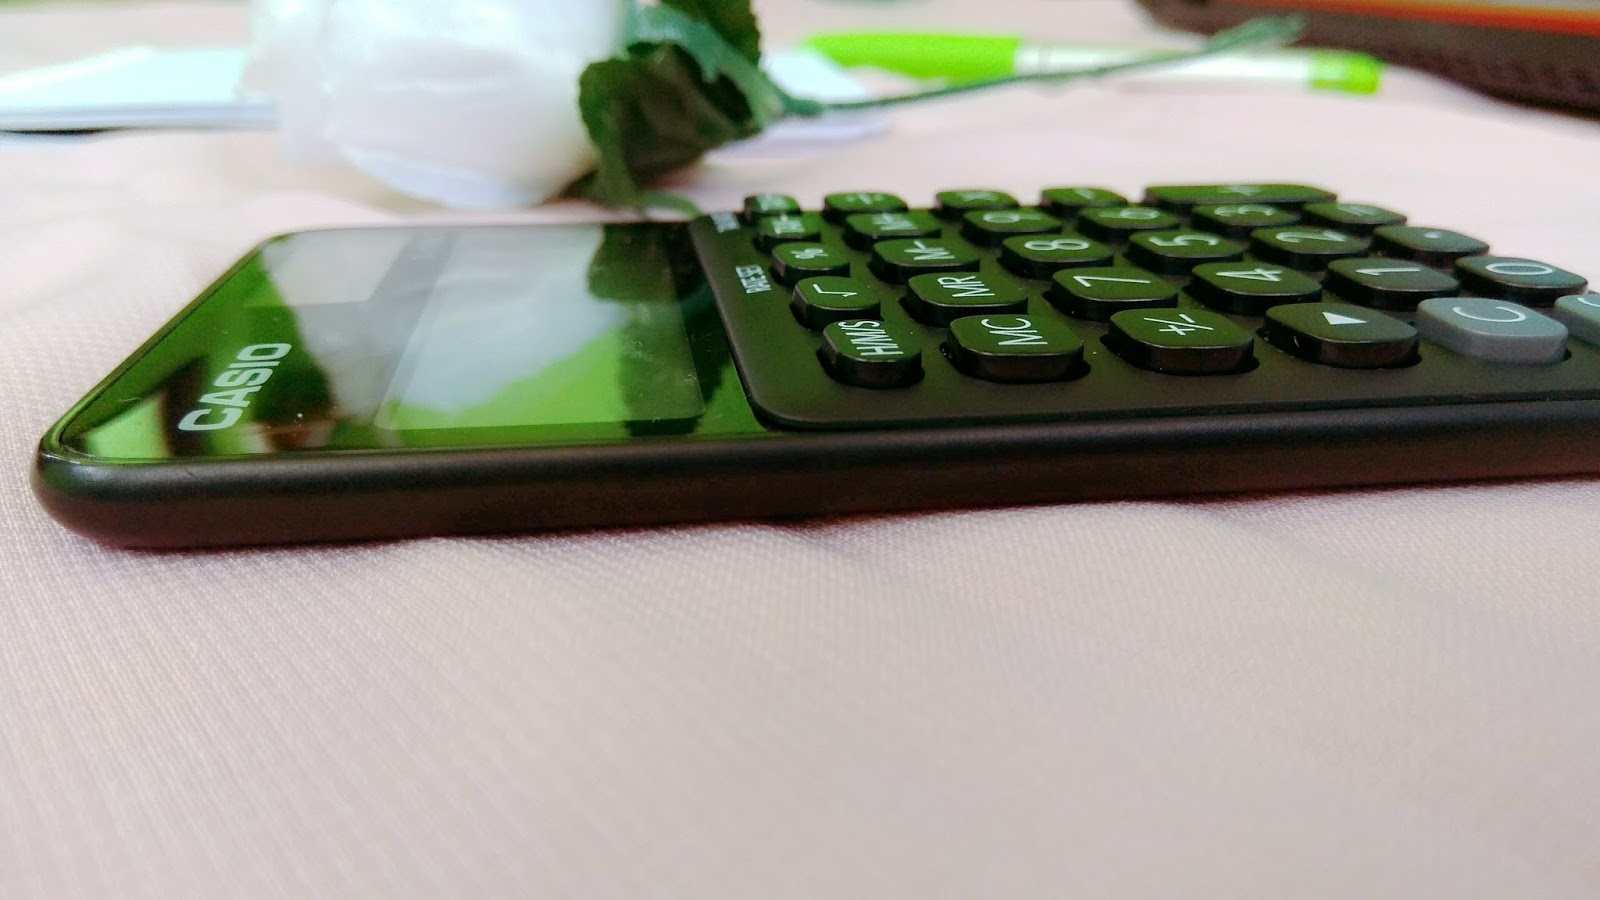 My Mood Booster With Casio Colorful Calculator Sweet Home Sl 310uc Orange Yang Super Slim Dan Ringan